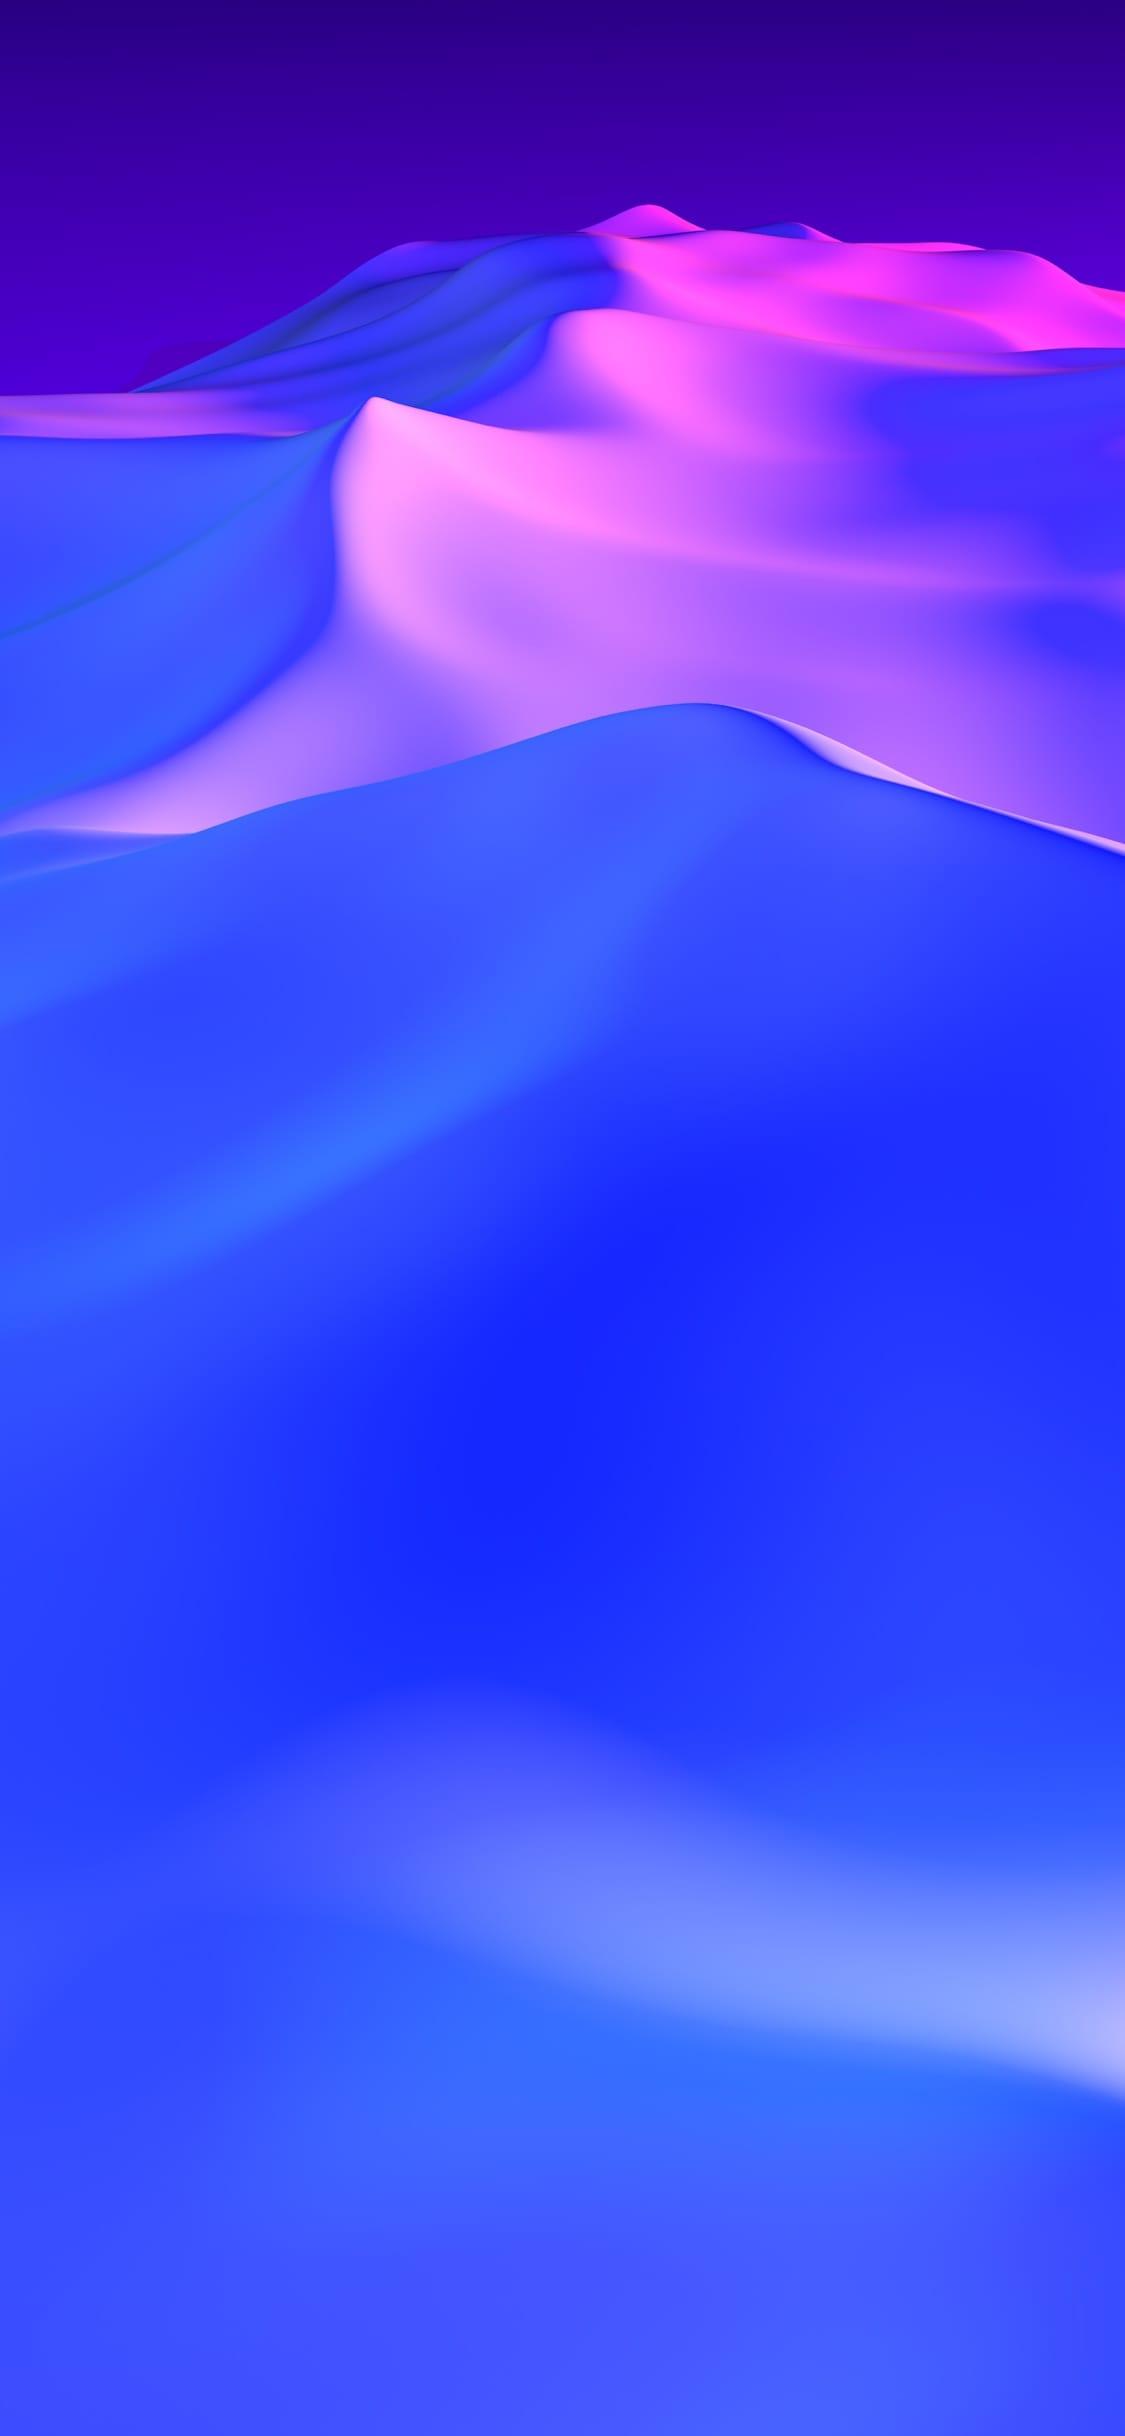 Sfondi Per Iphone X S9 P20 Oneplus 6 Ect Comunque Tutti I